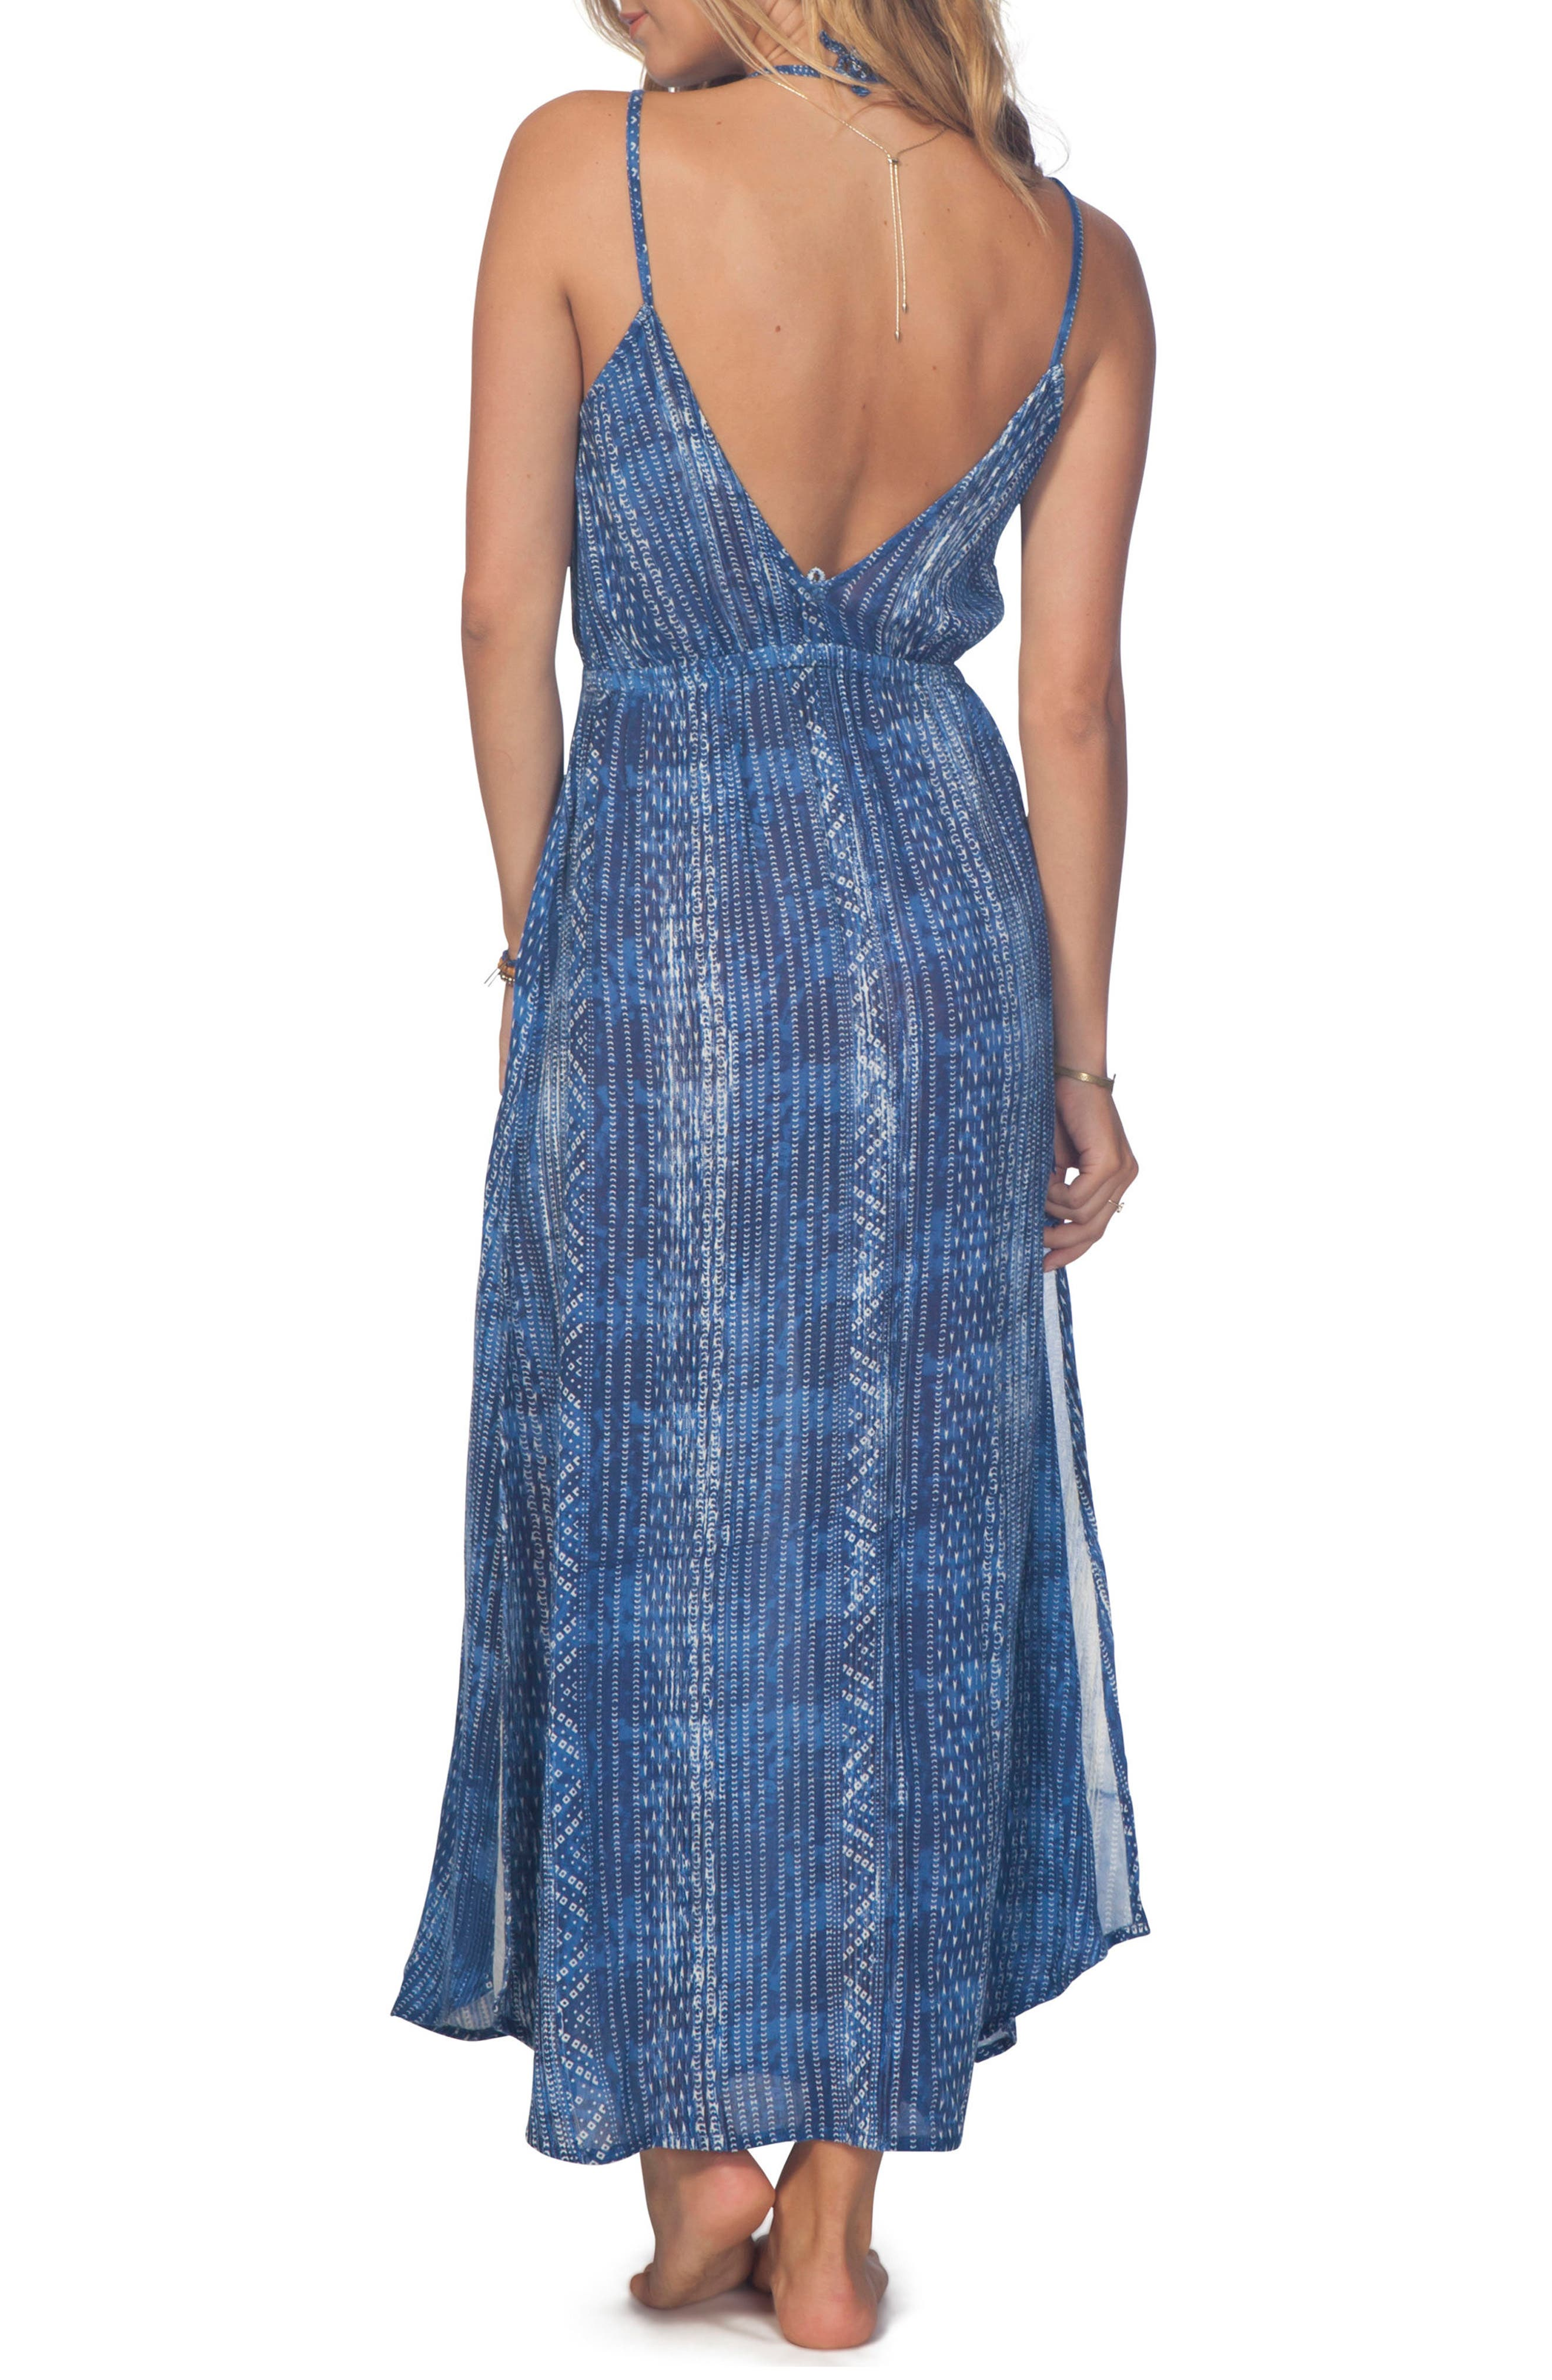 Blue Tides Maxi Dress,                             Alternate thumbnail 2, color,                             400